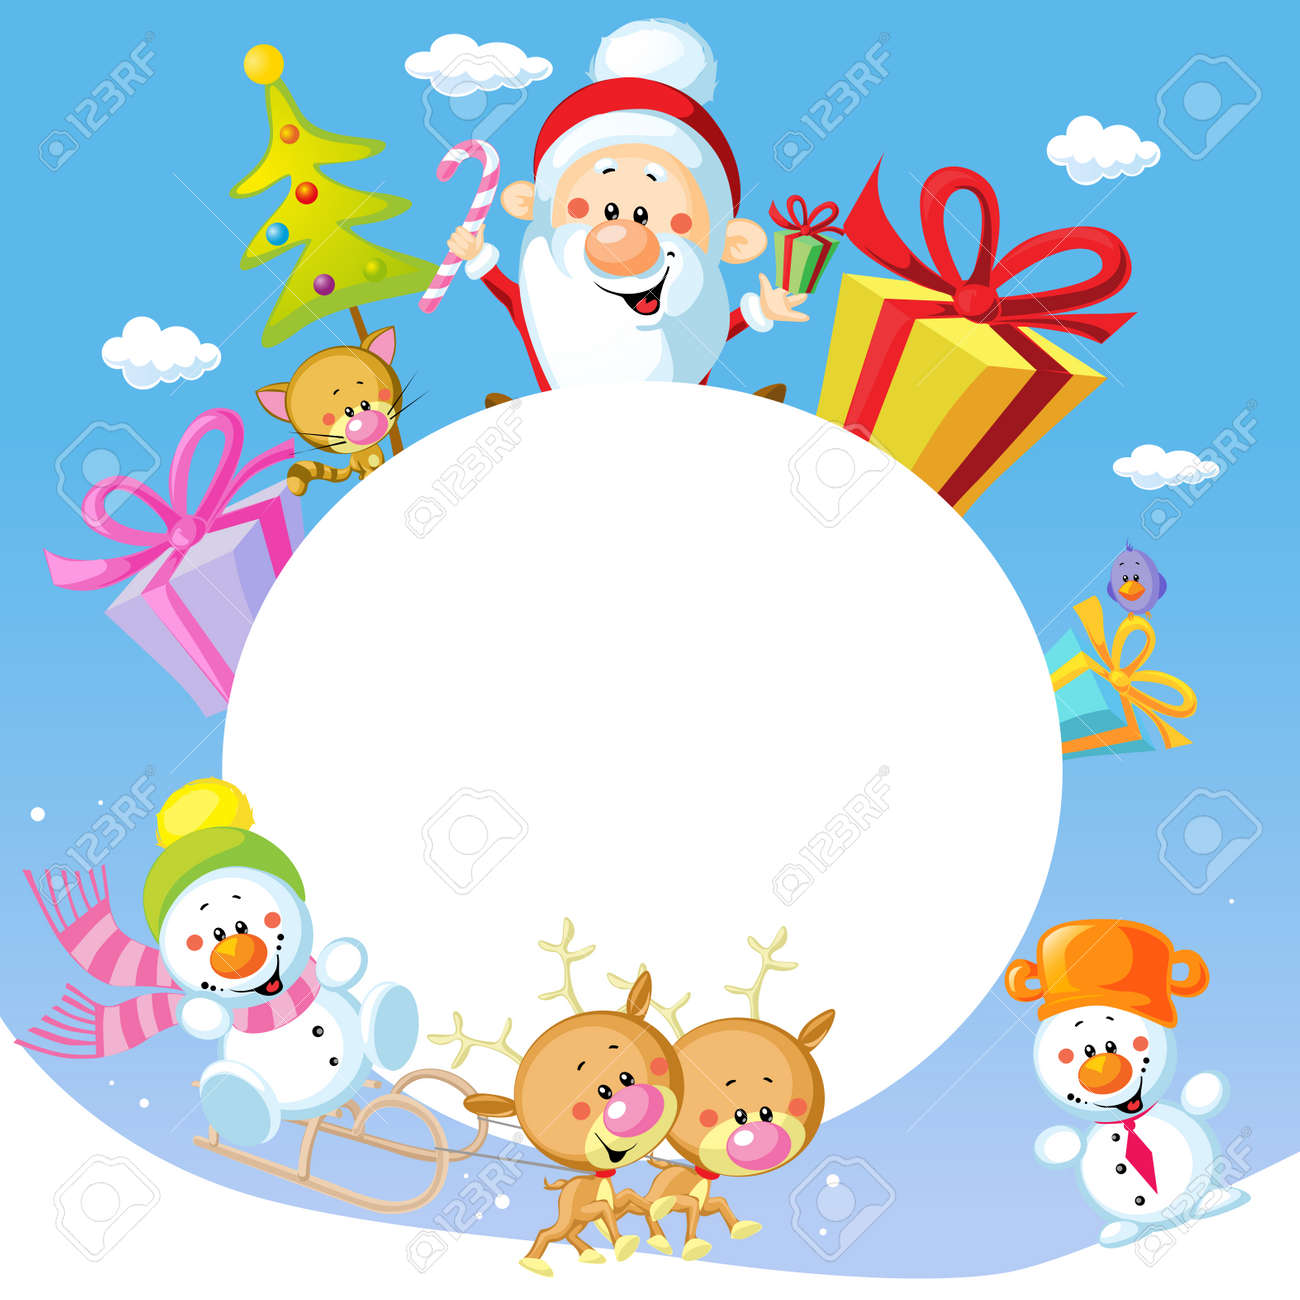 Merry Christmas Frame Design With Santa Claus Sleigh, Christmas Tree,  Snowman And Cute Animal